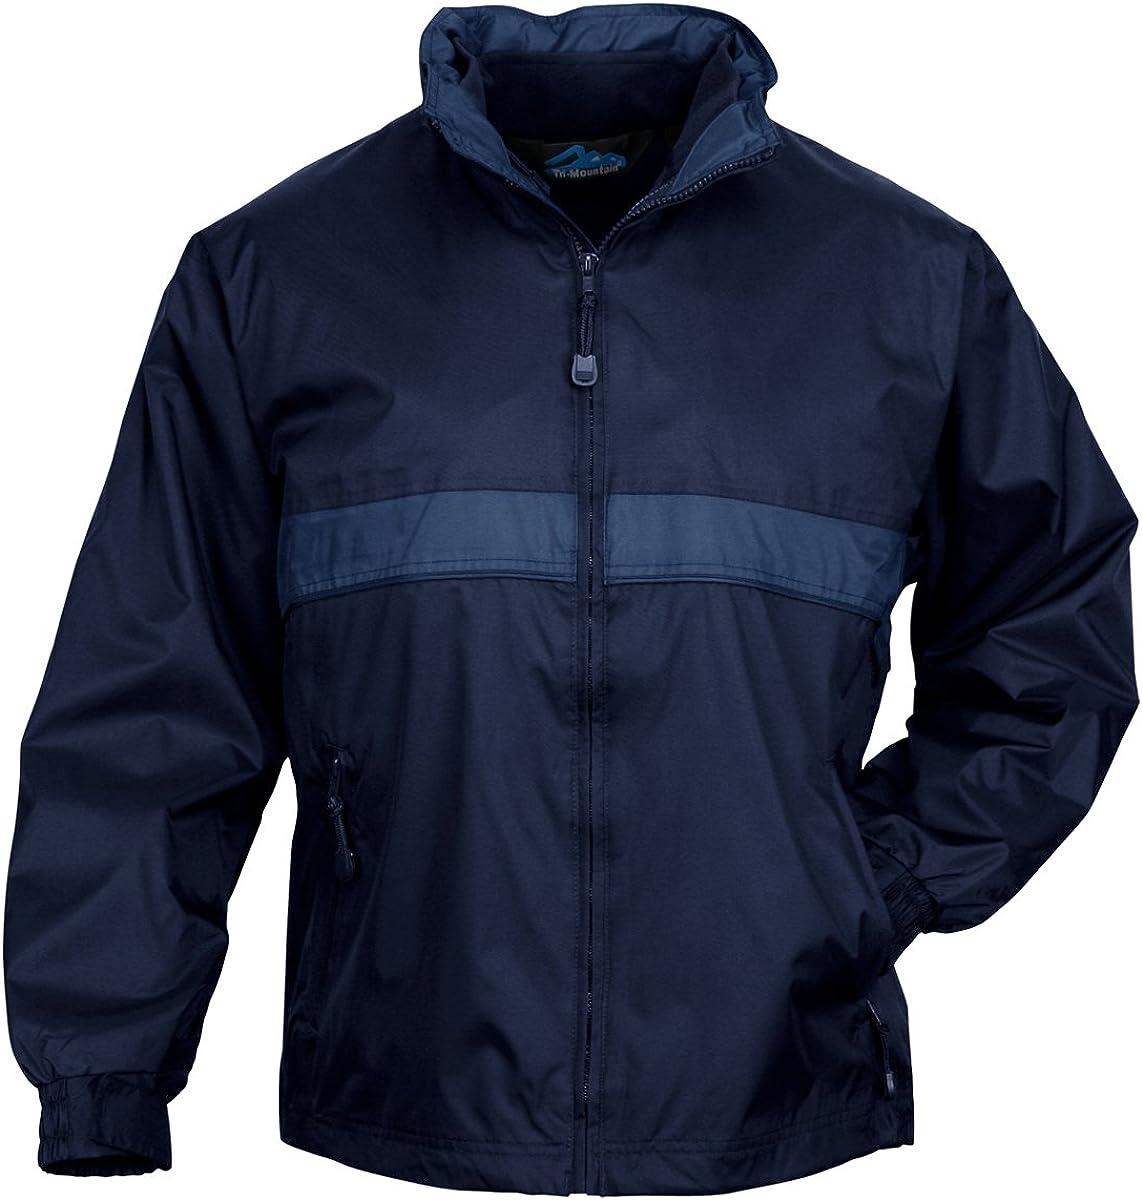 Tri-mountain Mens waterproof nylon 3-in-1 jacket. - NAVY / MOUNTAIN BLUE - XX-Large